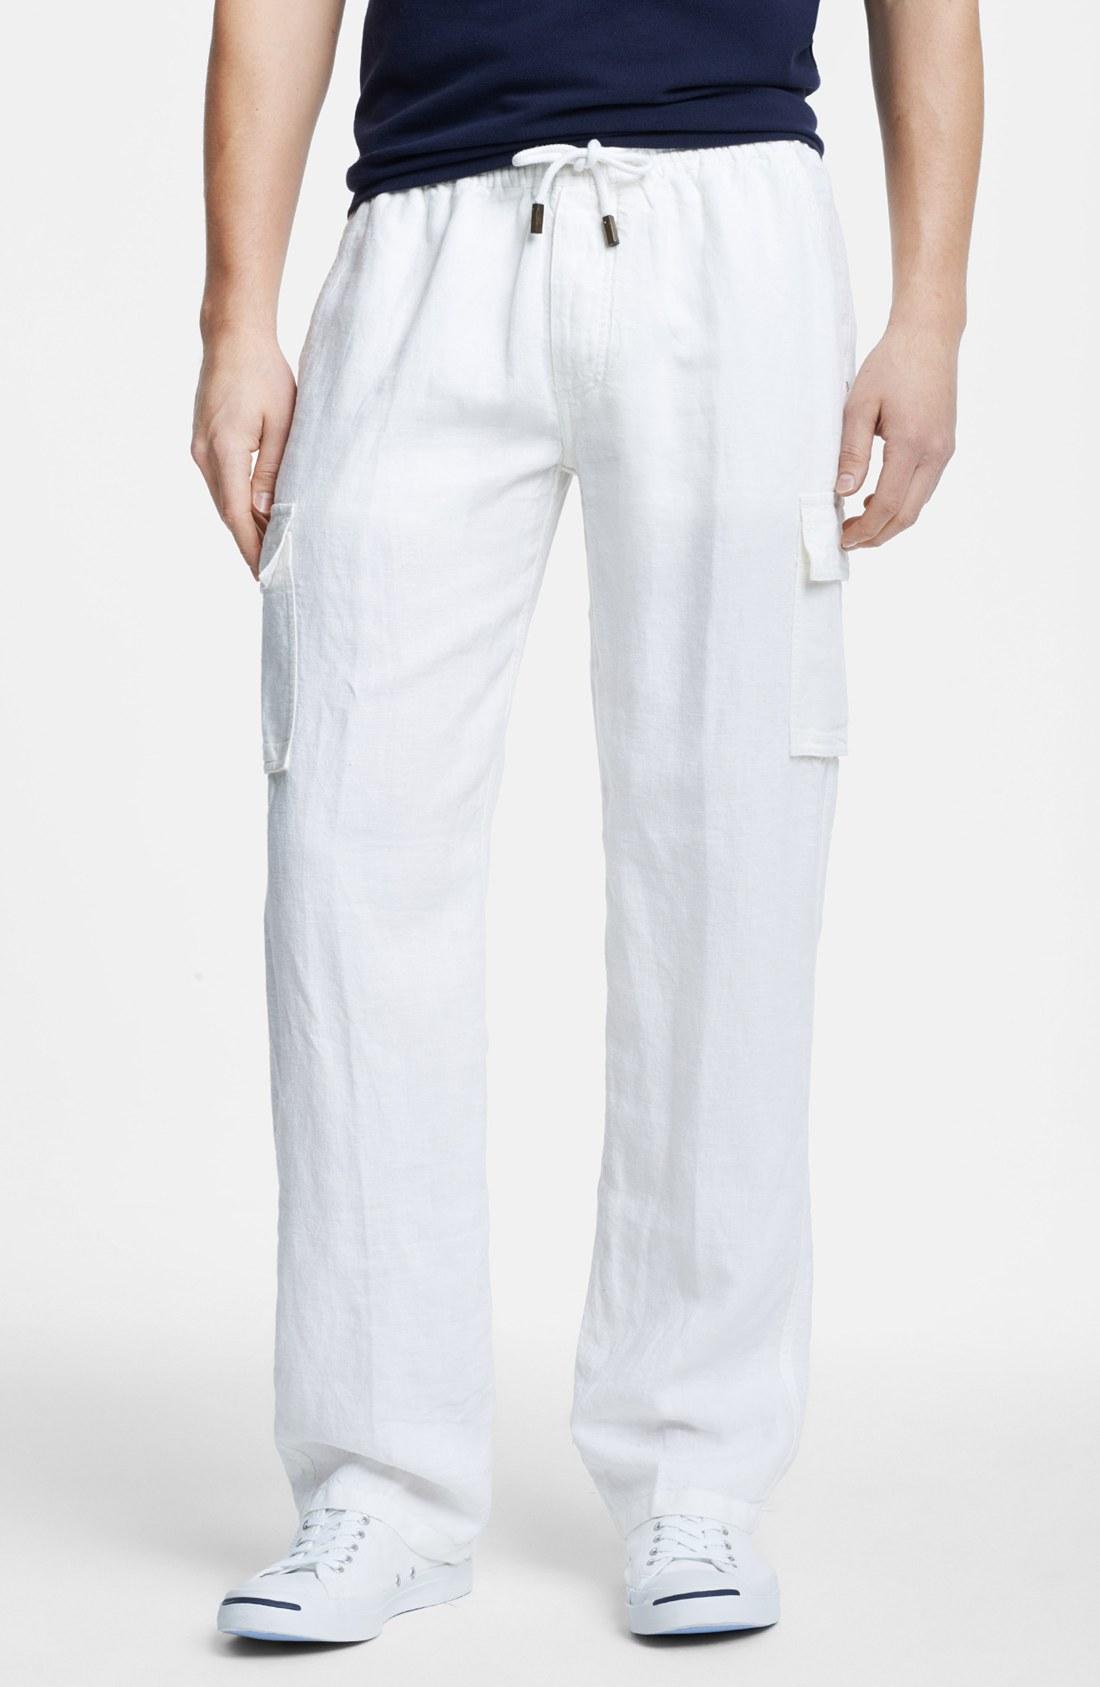 linen cargo pants for men - Pi Pants